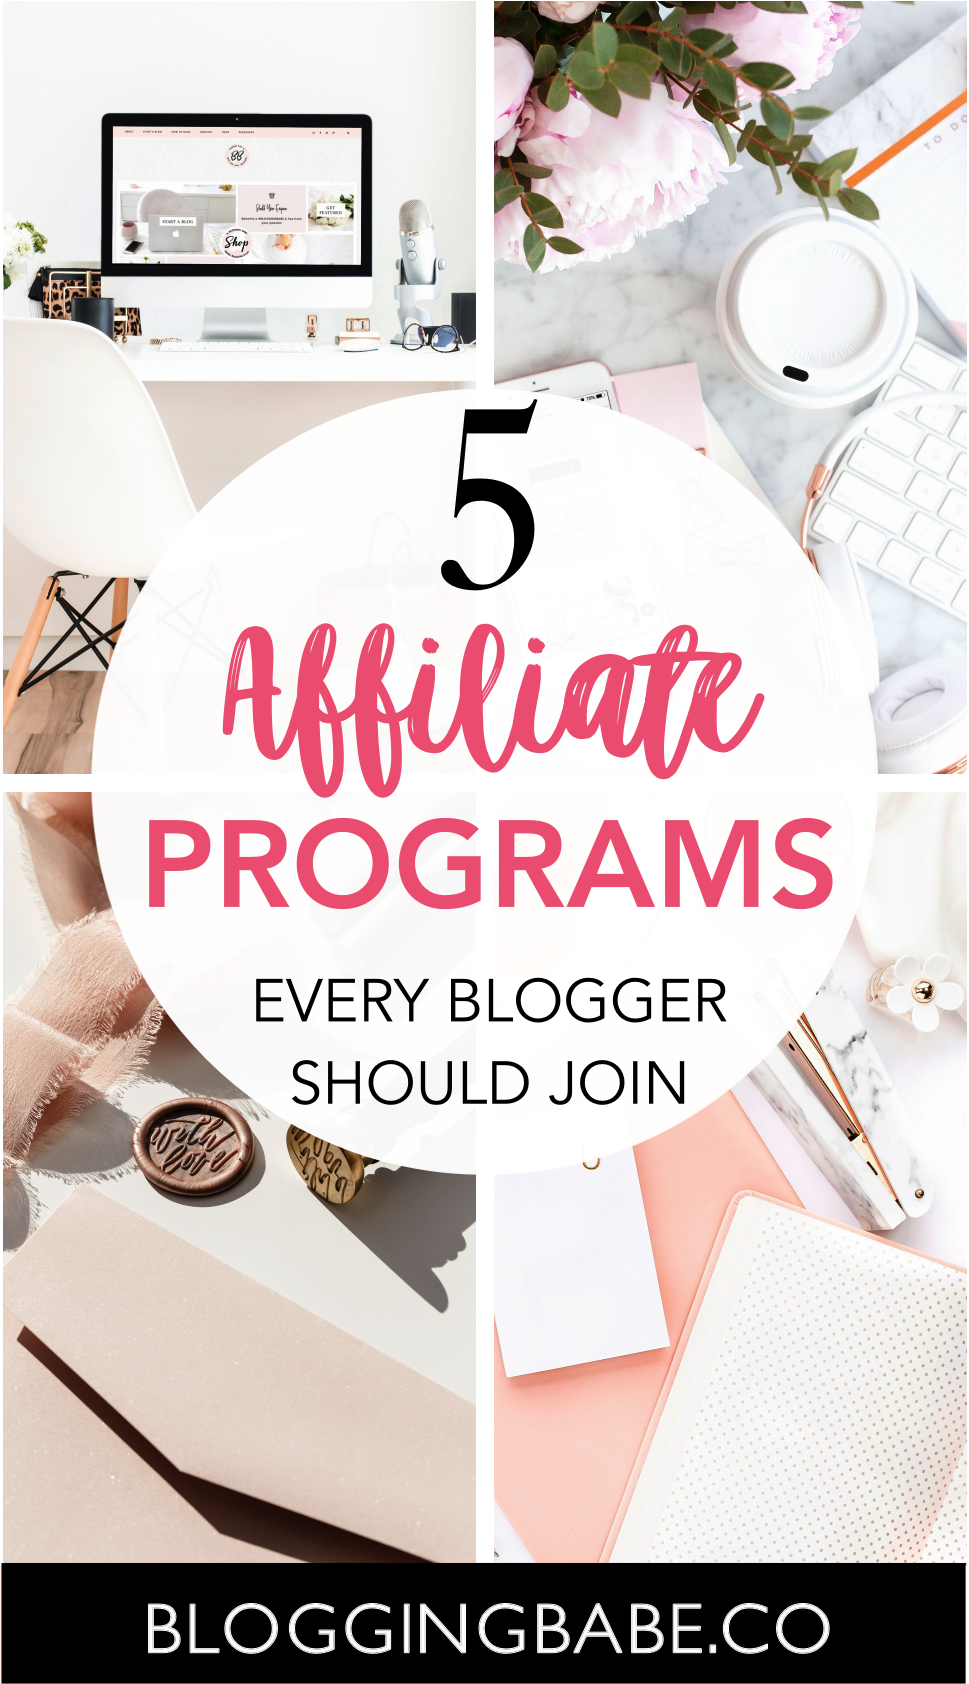 230 Ideas De 1 Blog Blogging Consejos De Blog Empezar Un Blog